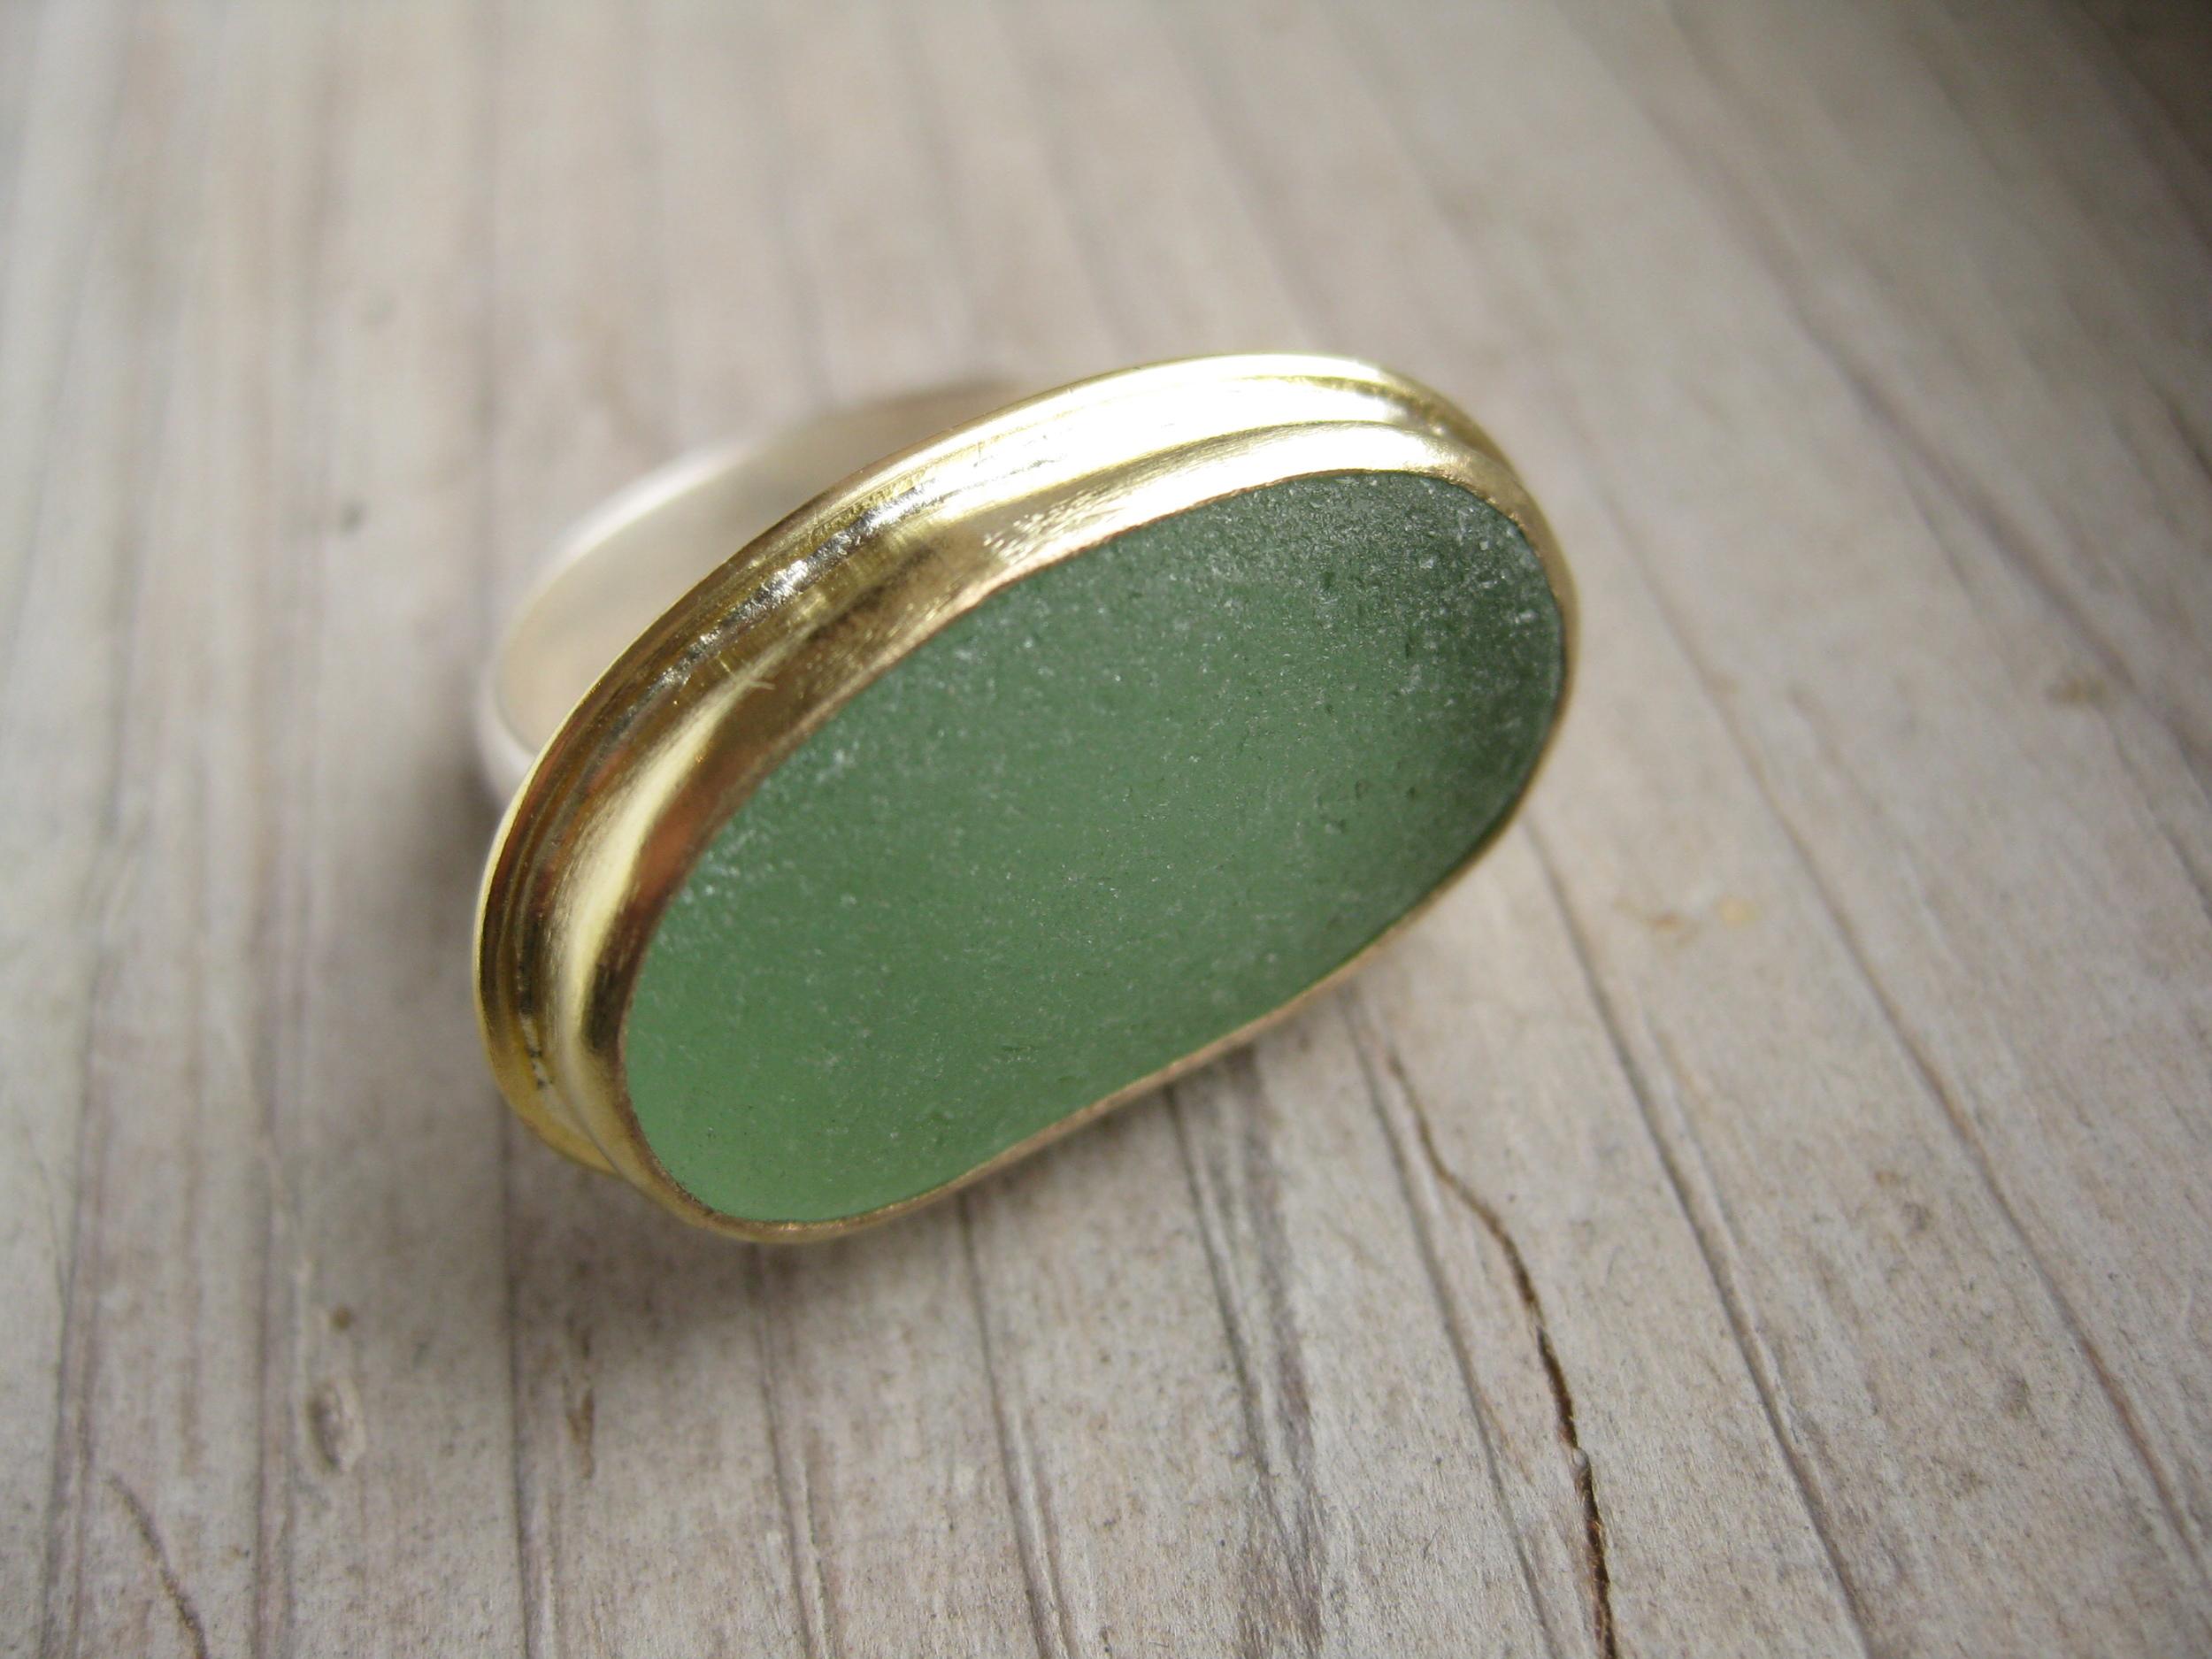 Natural Sea Glass Ring by Lisa Hall